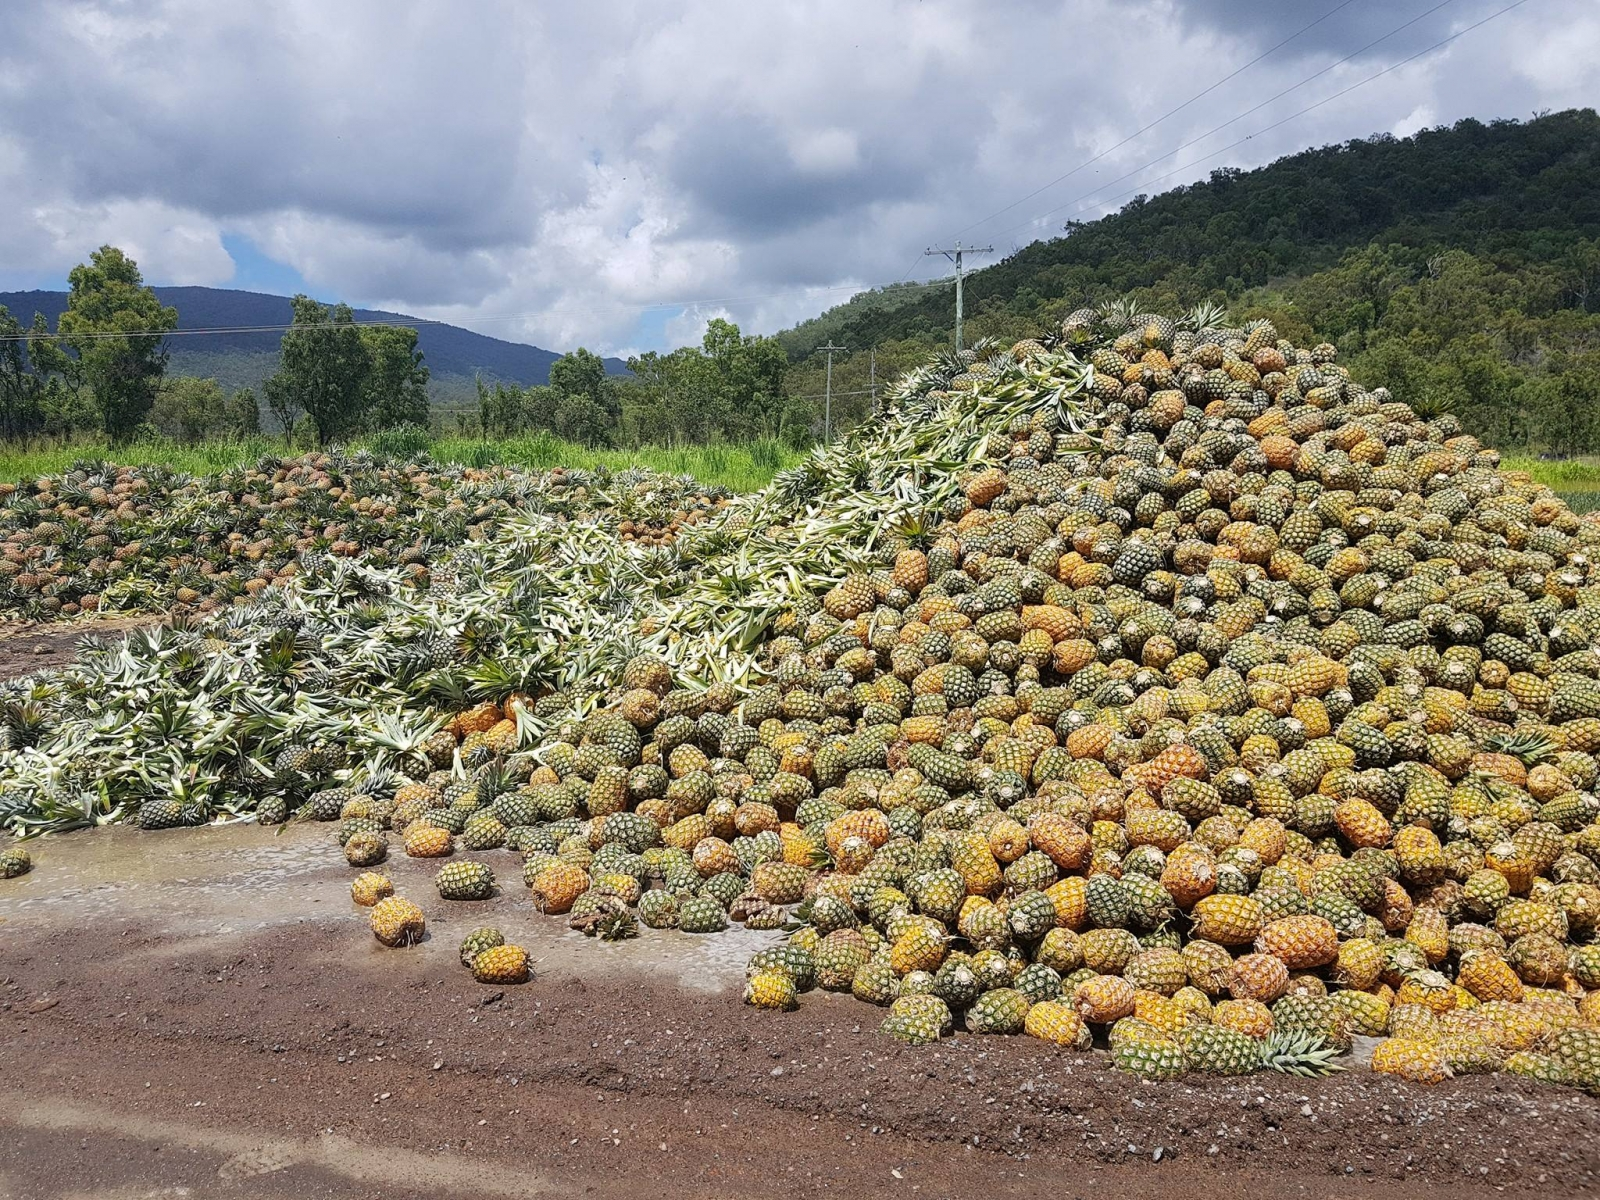 Rotting pineapples